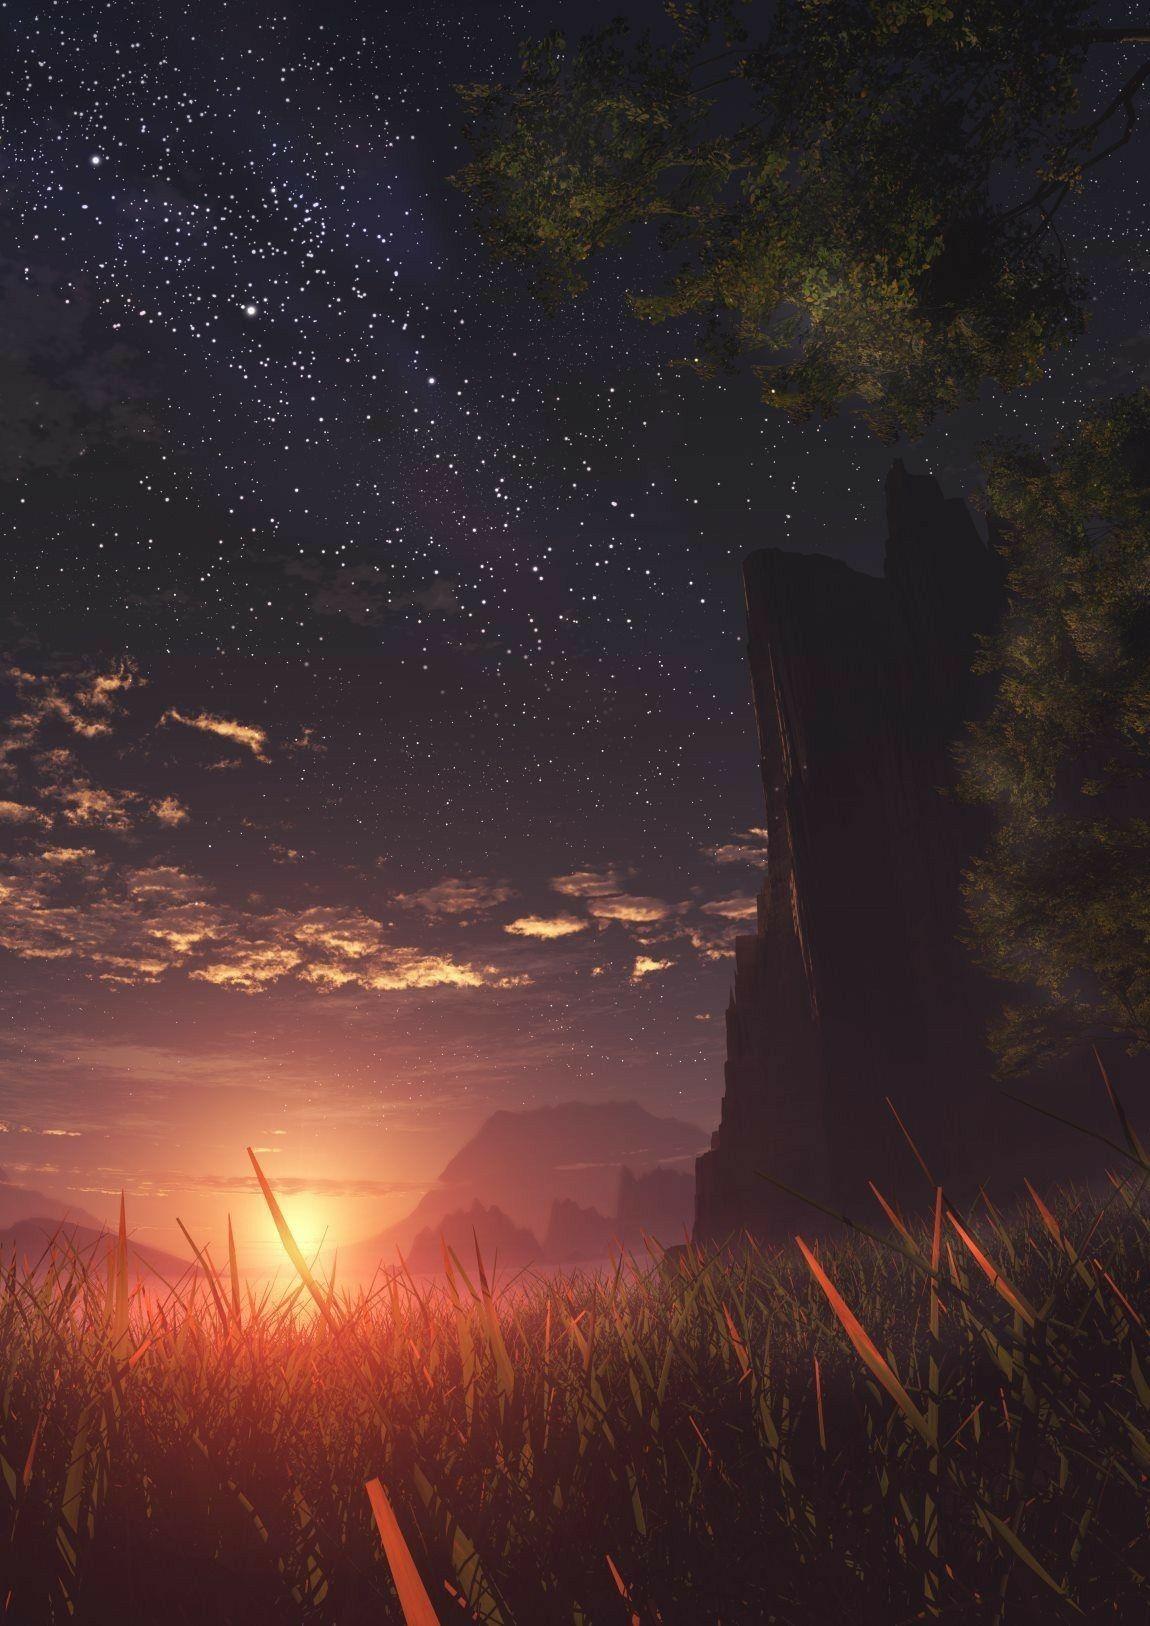 Sunset over the field illustration #art #digitalart #digitalpainting